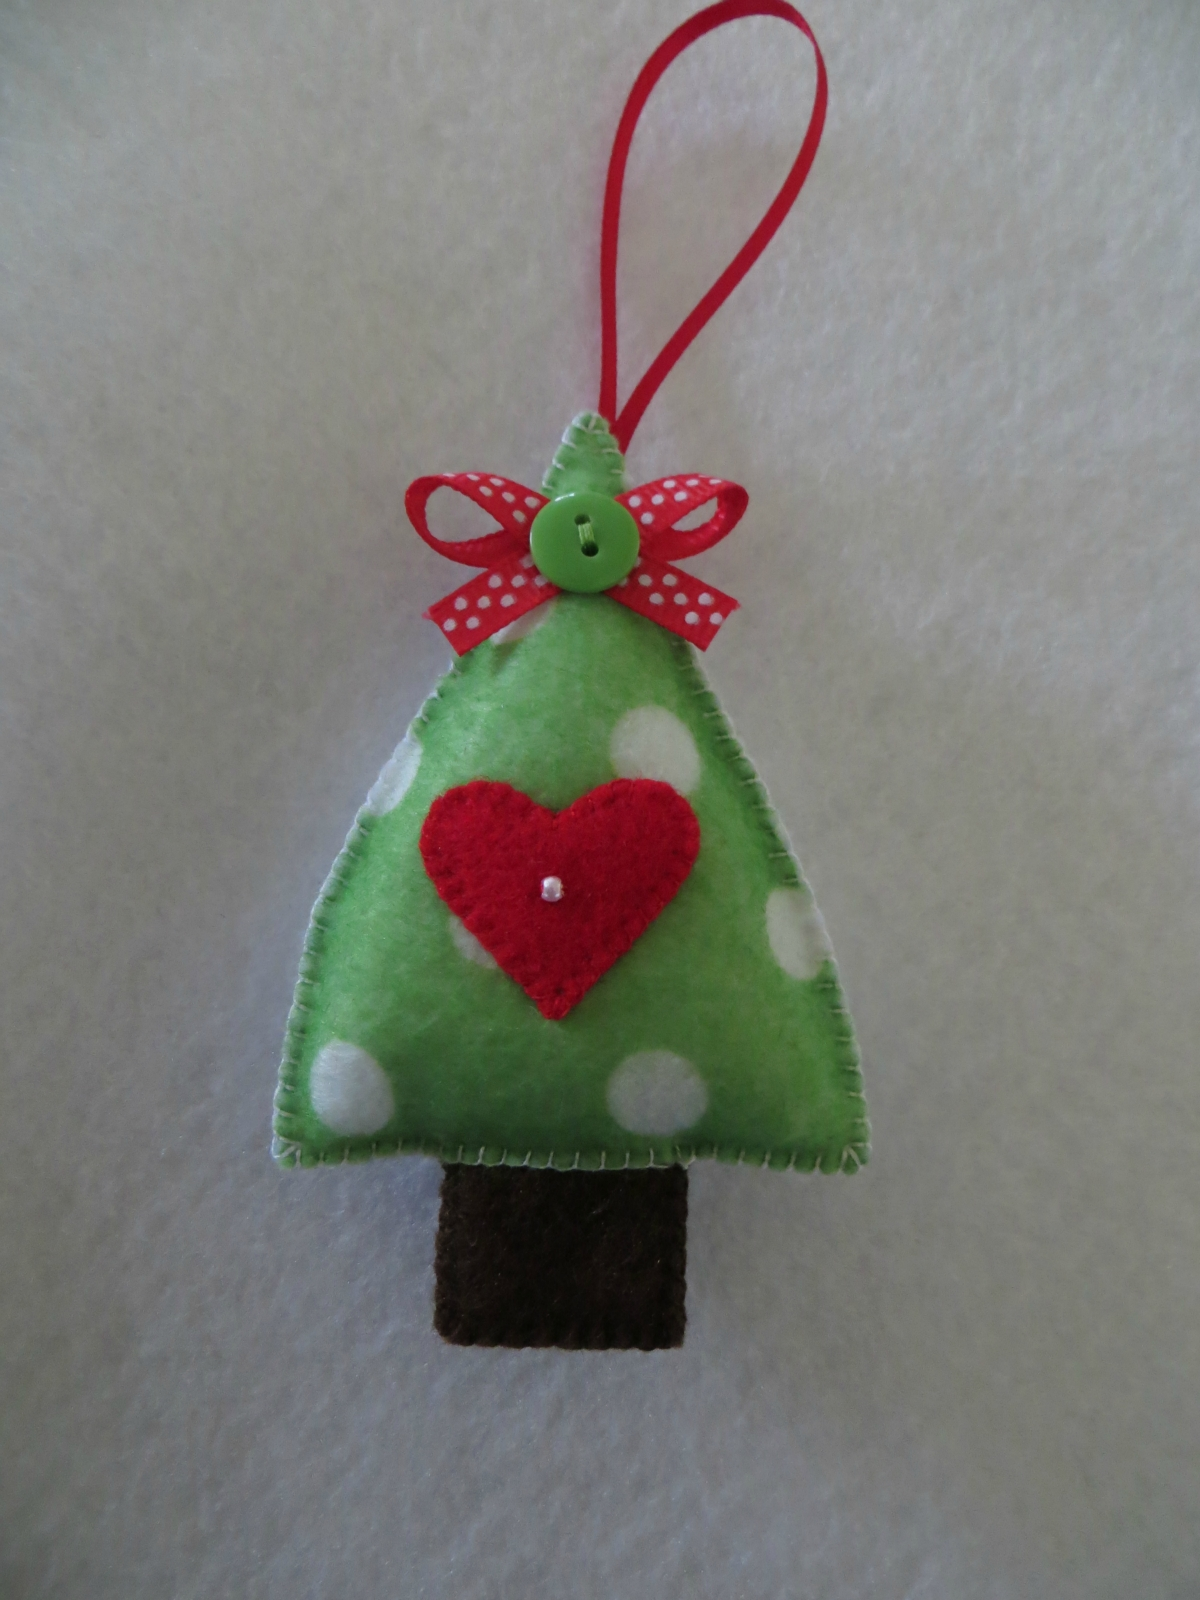 Hand stitched felt christmas tree ornament